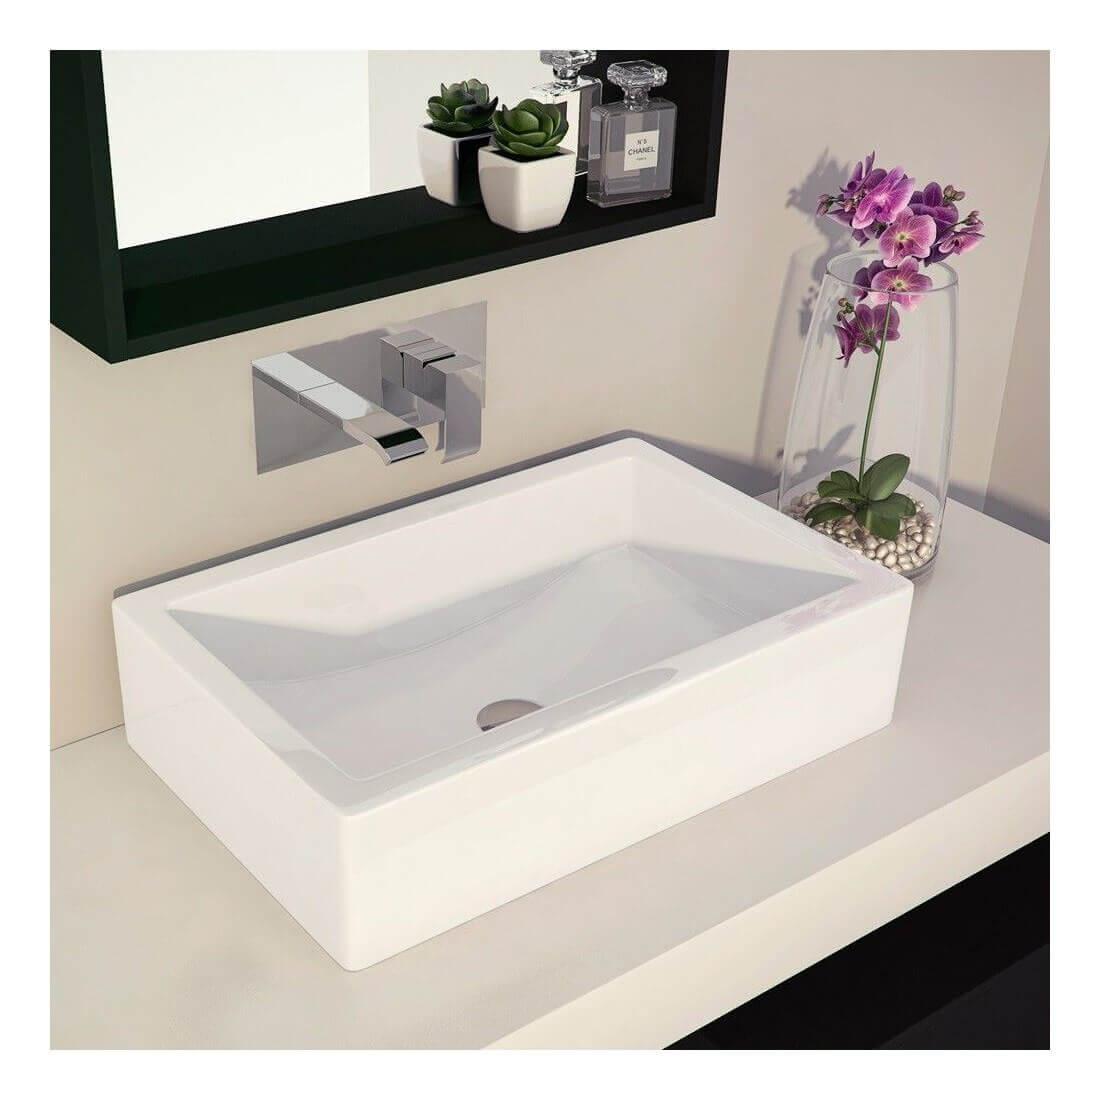 Mueble para lavabo sobre encimera dise os for Mueble lavabo sobre encimera